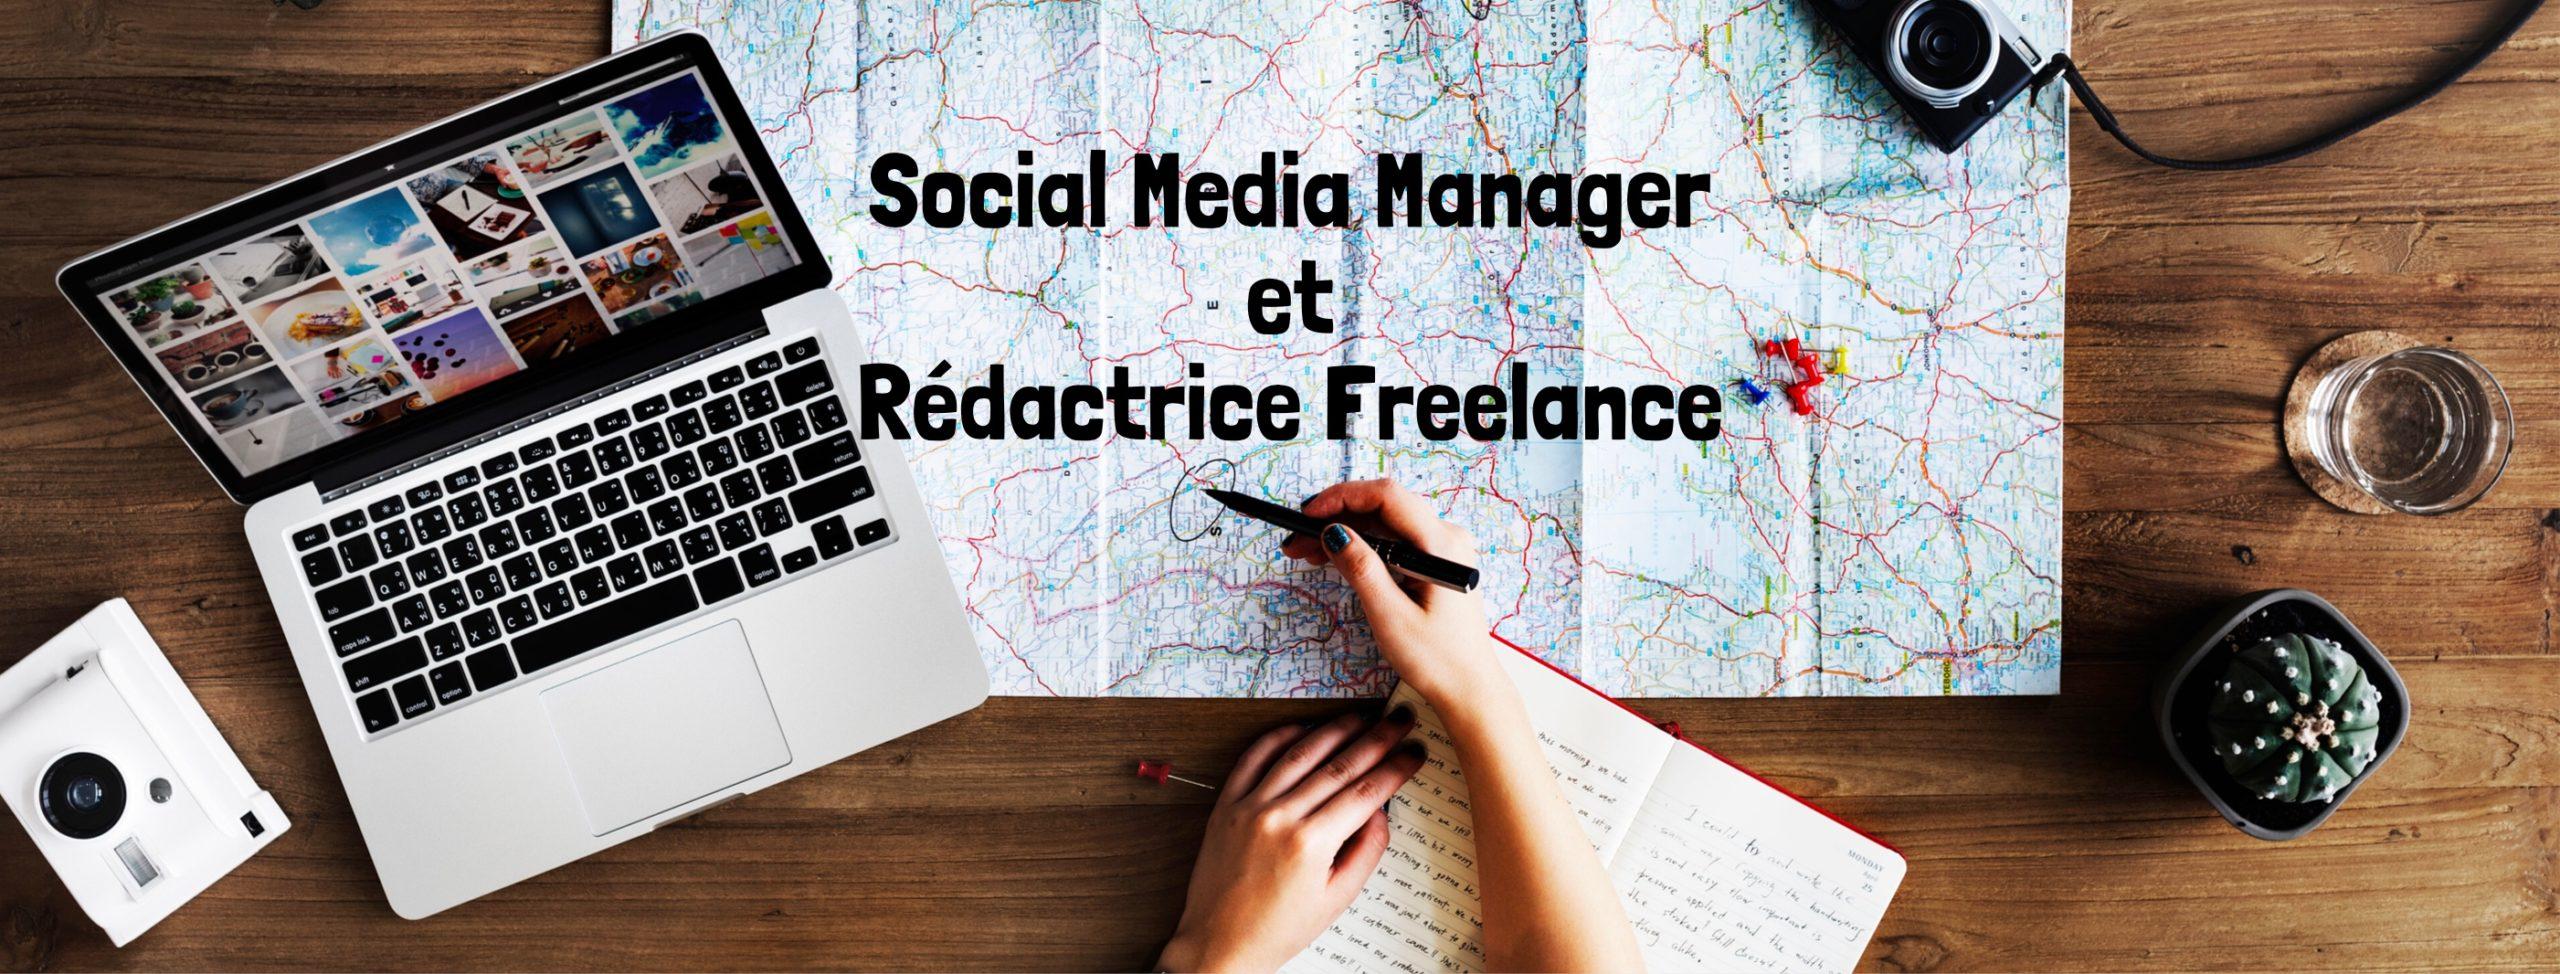 Social Media Manager et Rédactrice Freelance